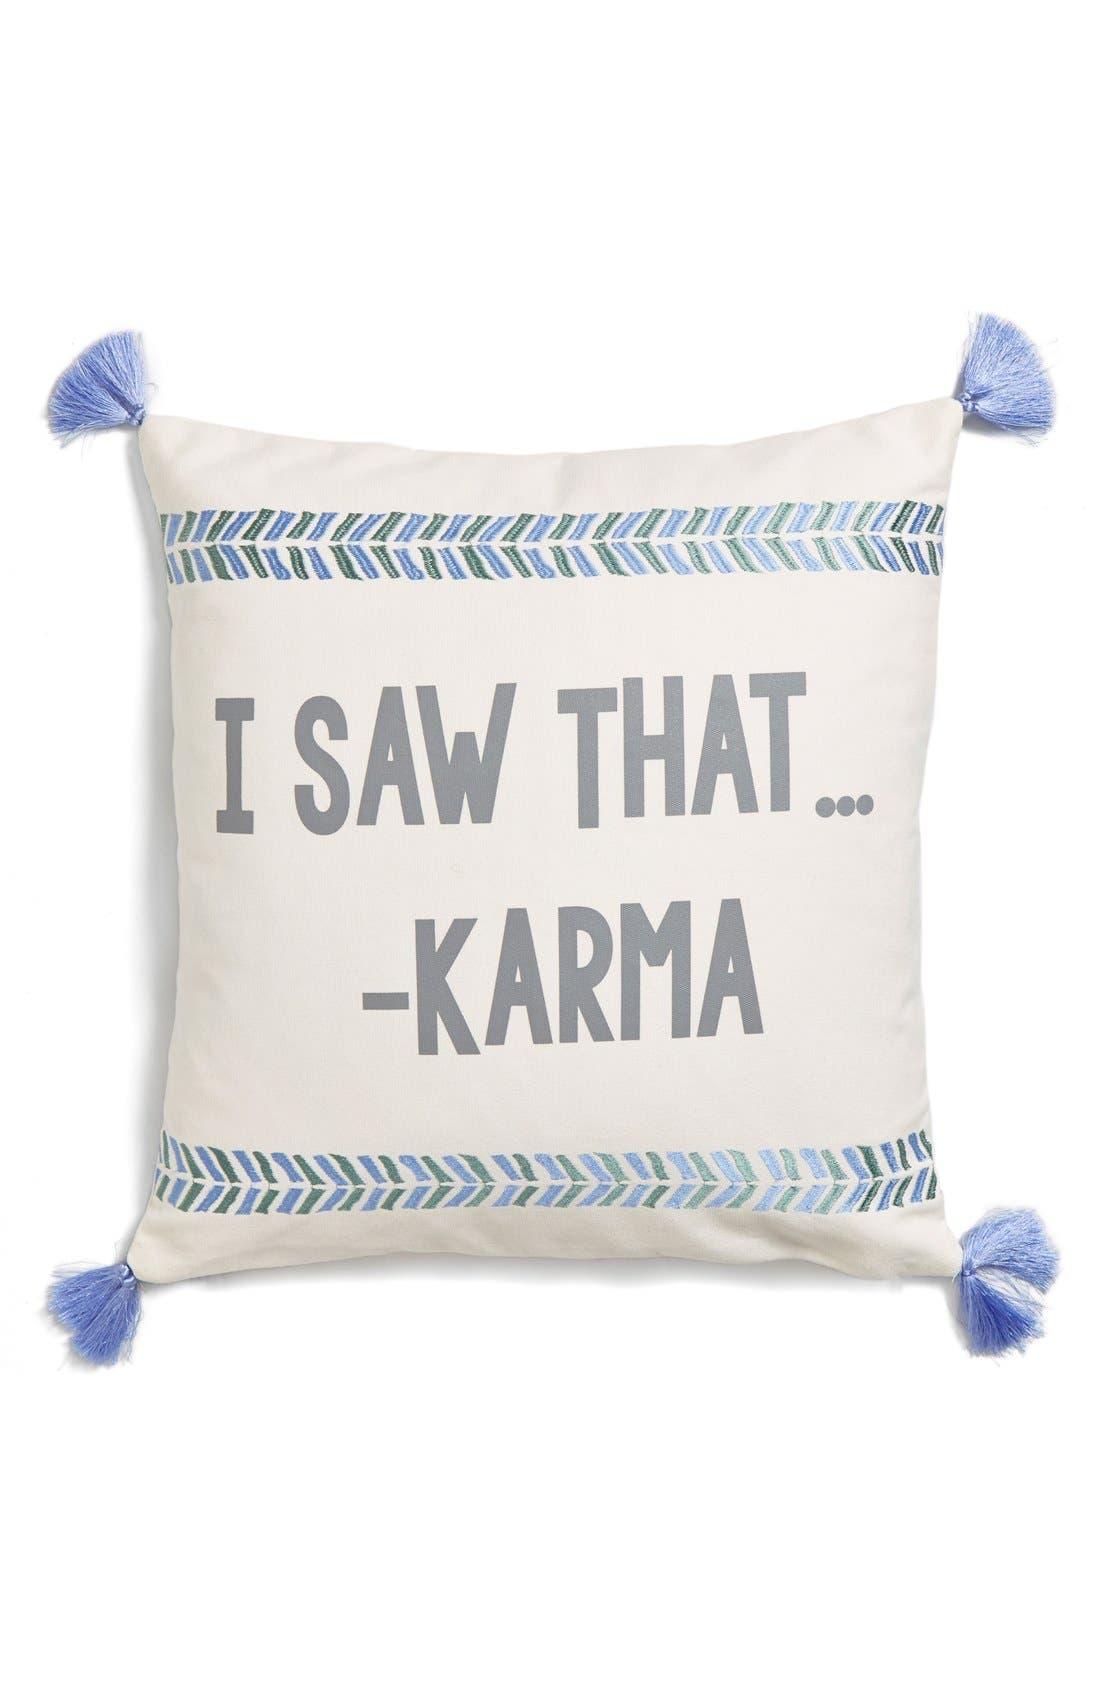 Main Image - Levtex 'I Saw That... -Karma' Pillow